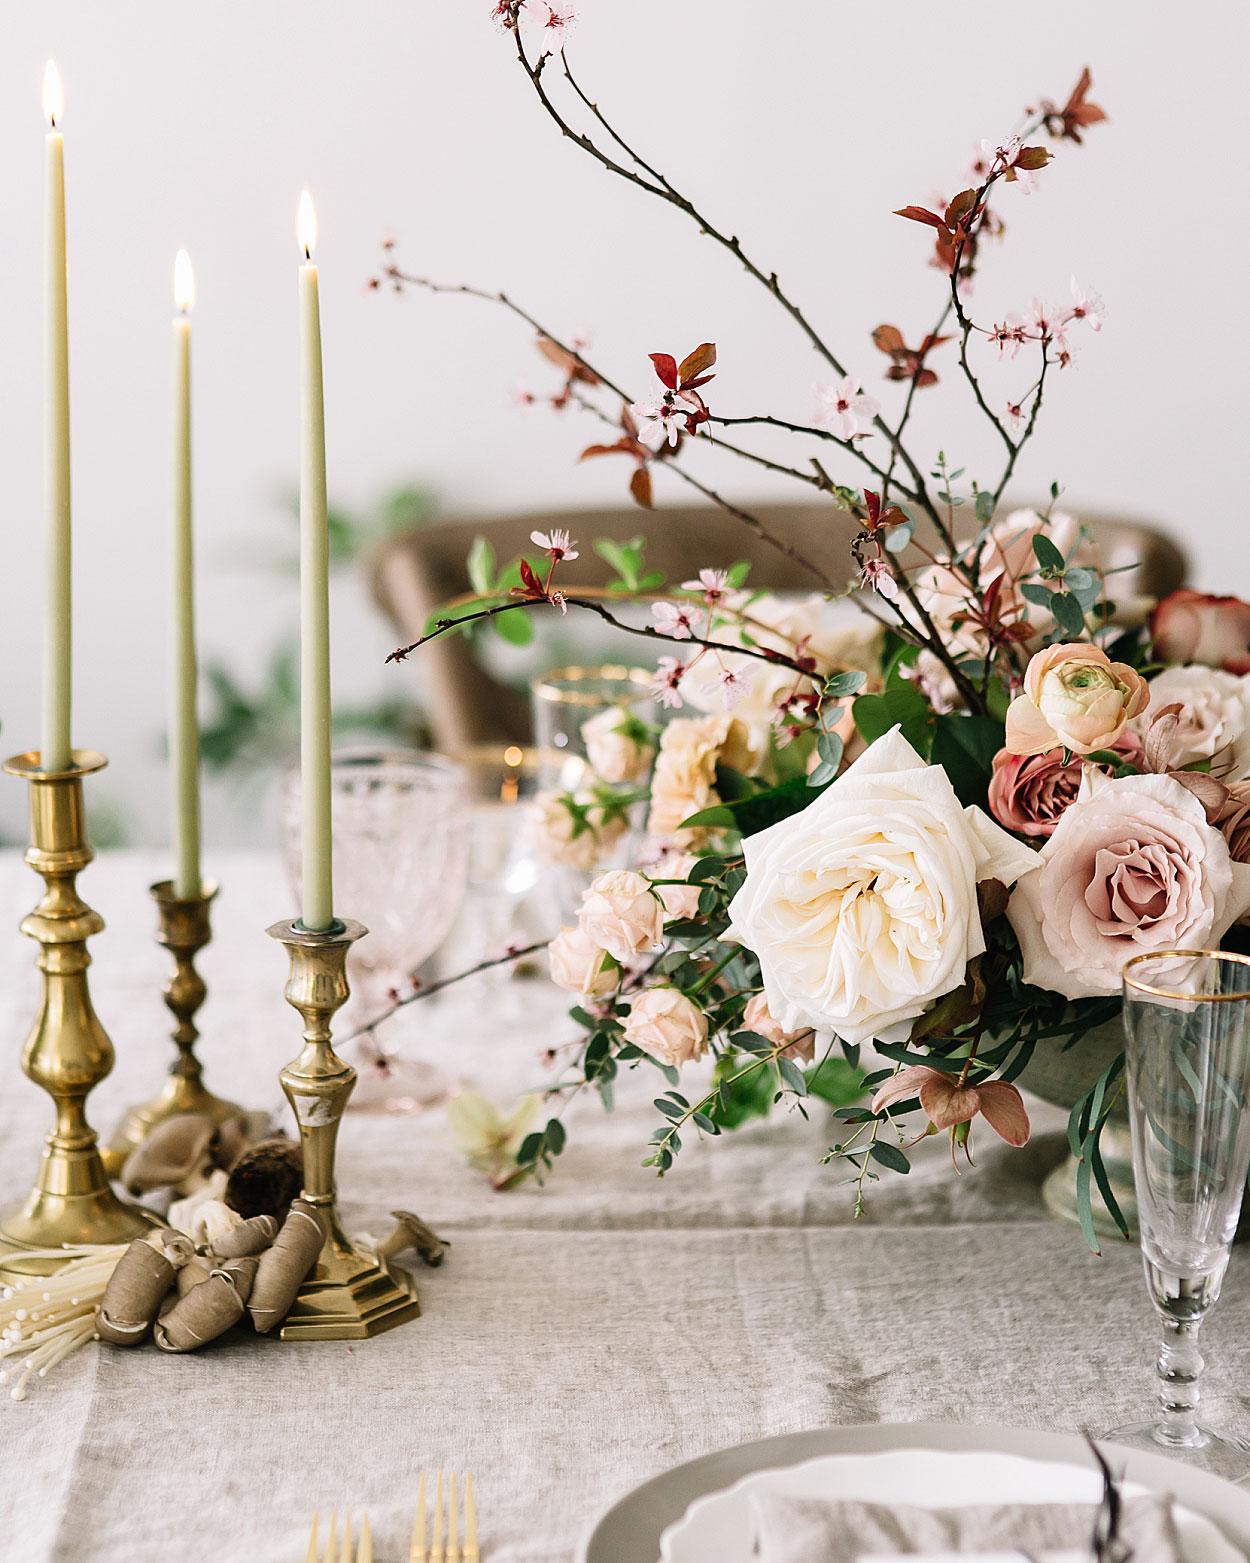 romantic-wedding-flowers-centerpiece-0516.jpg